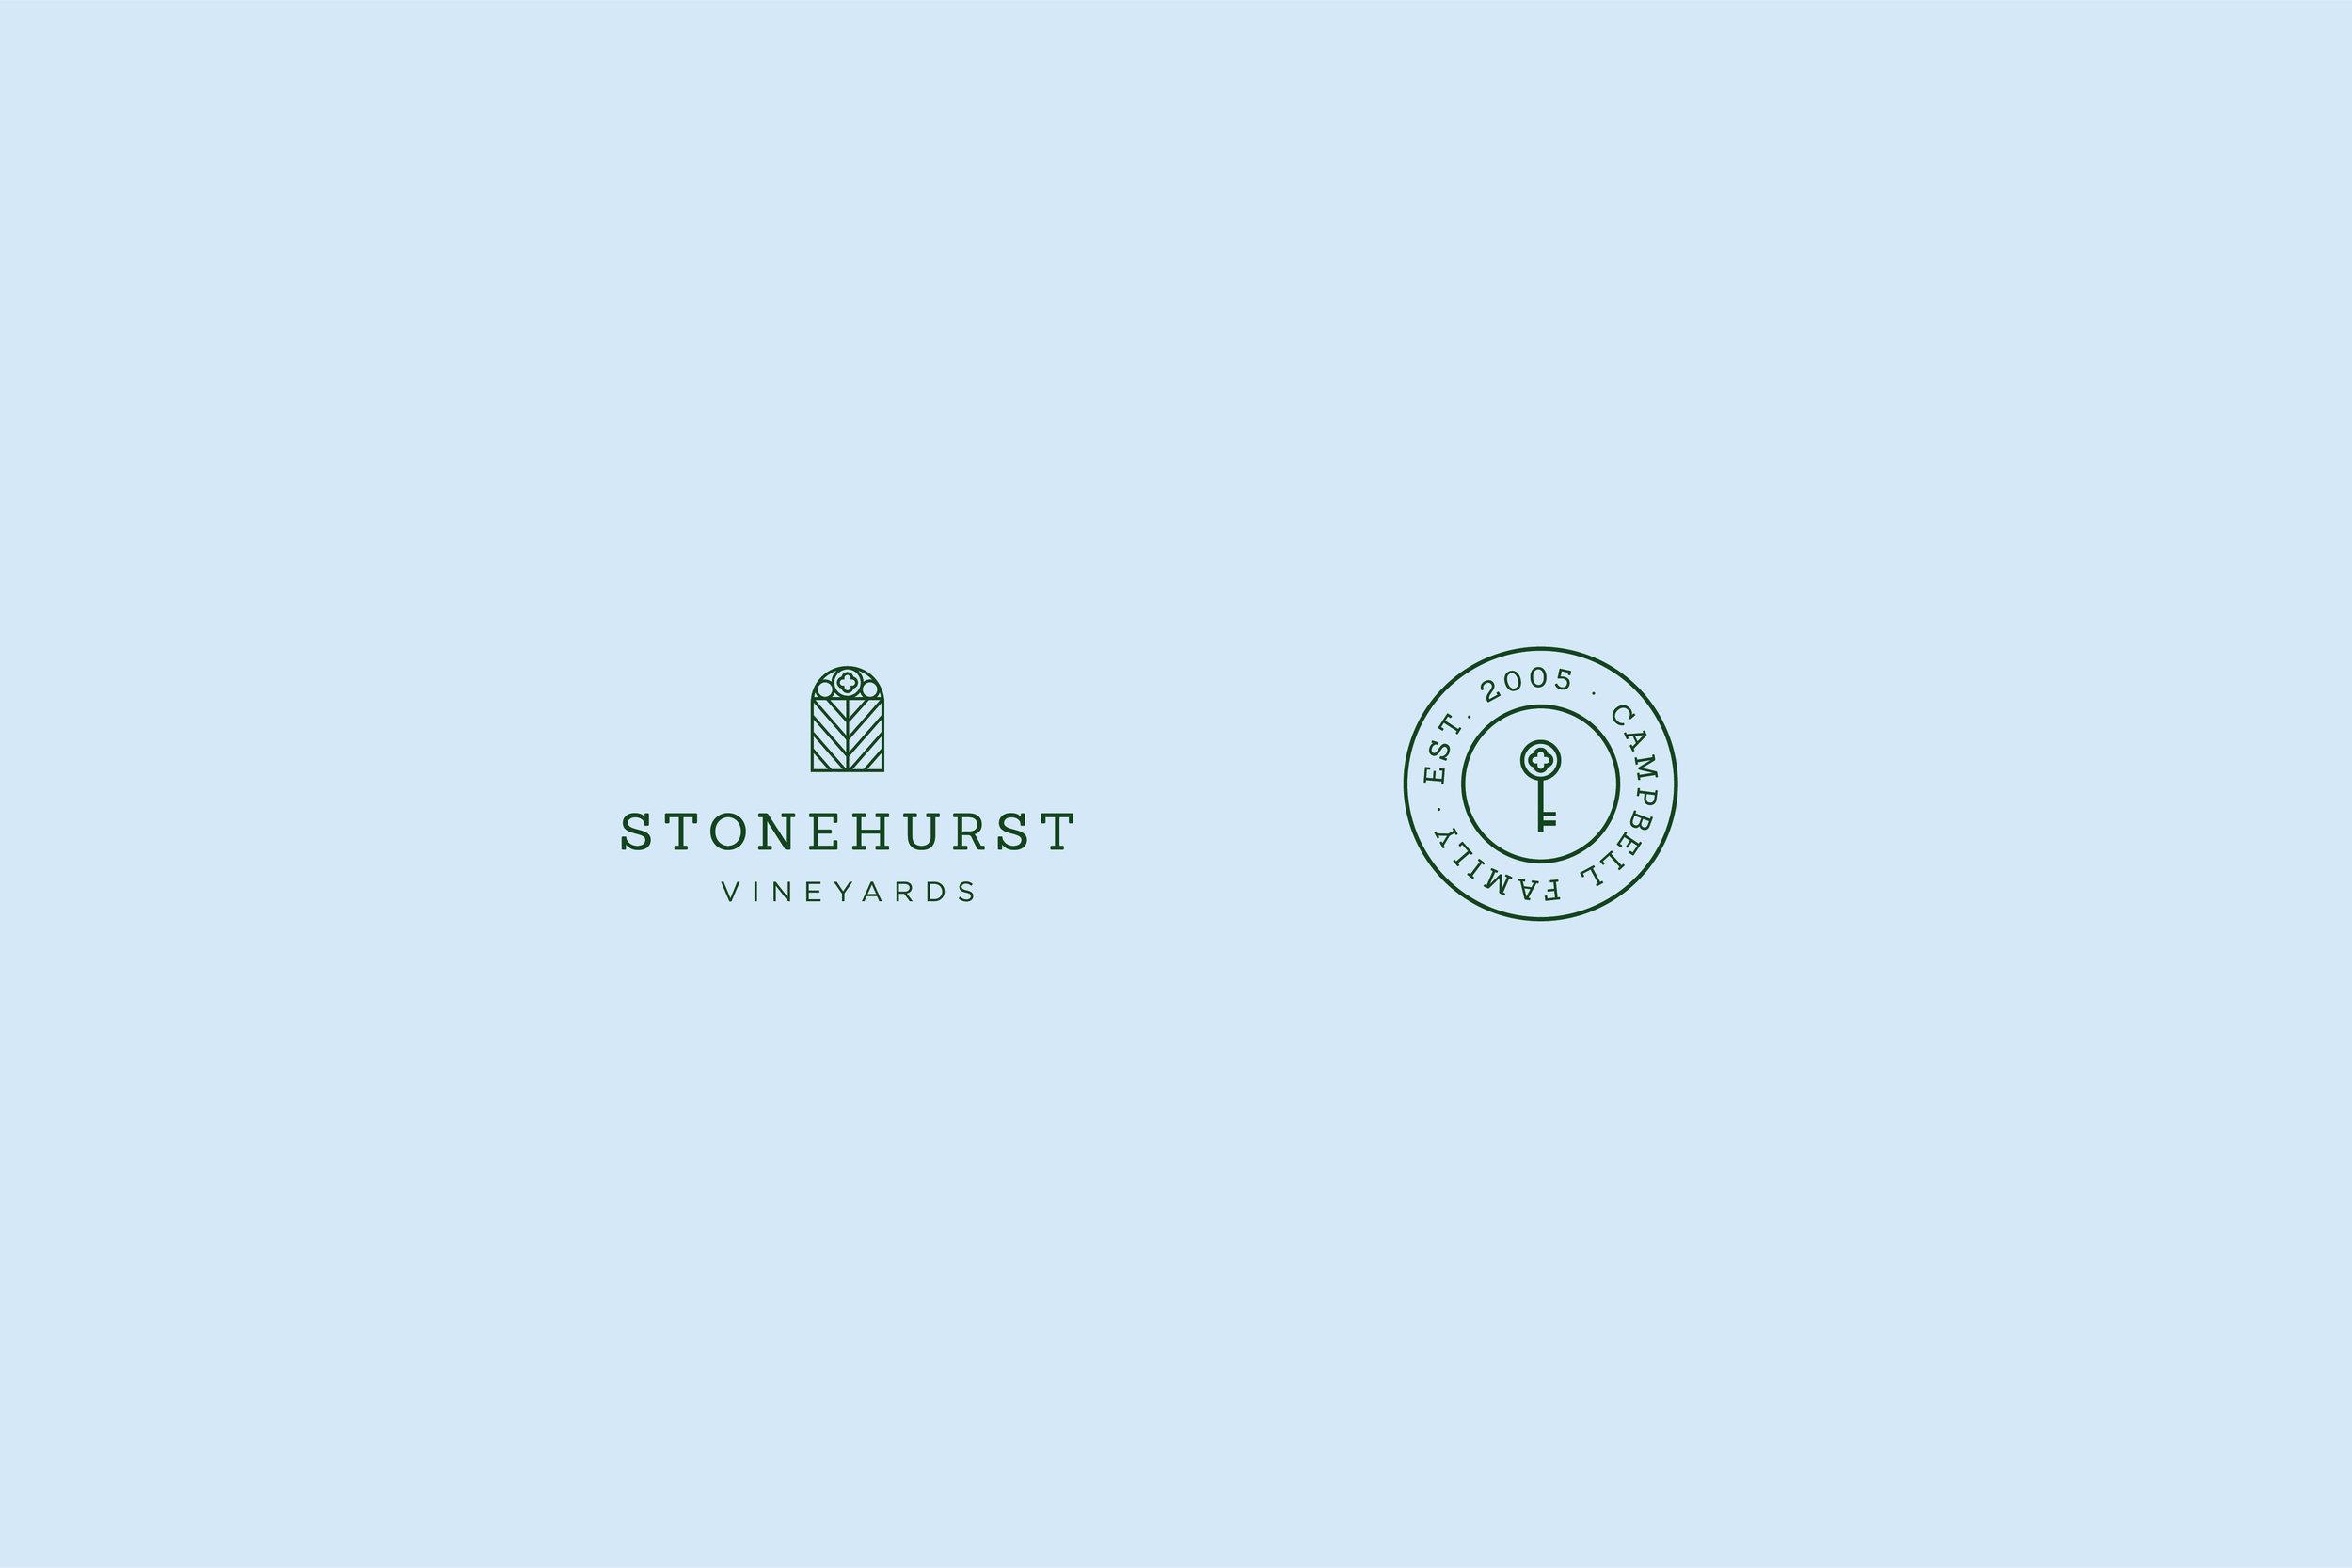 Stonehurst_Elements-02.jpg